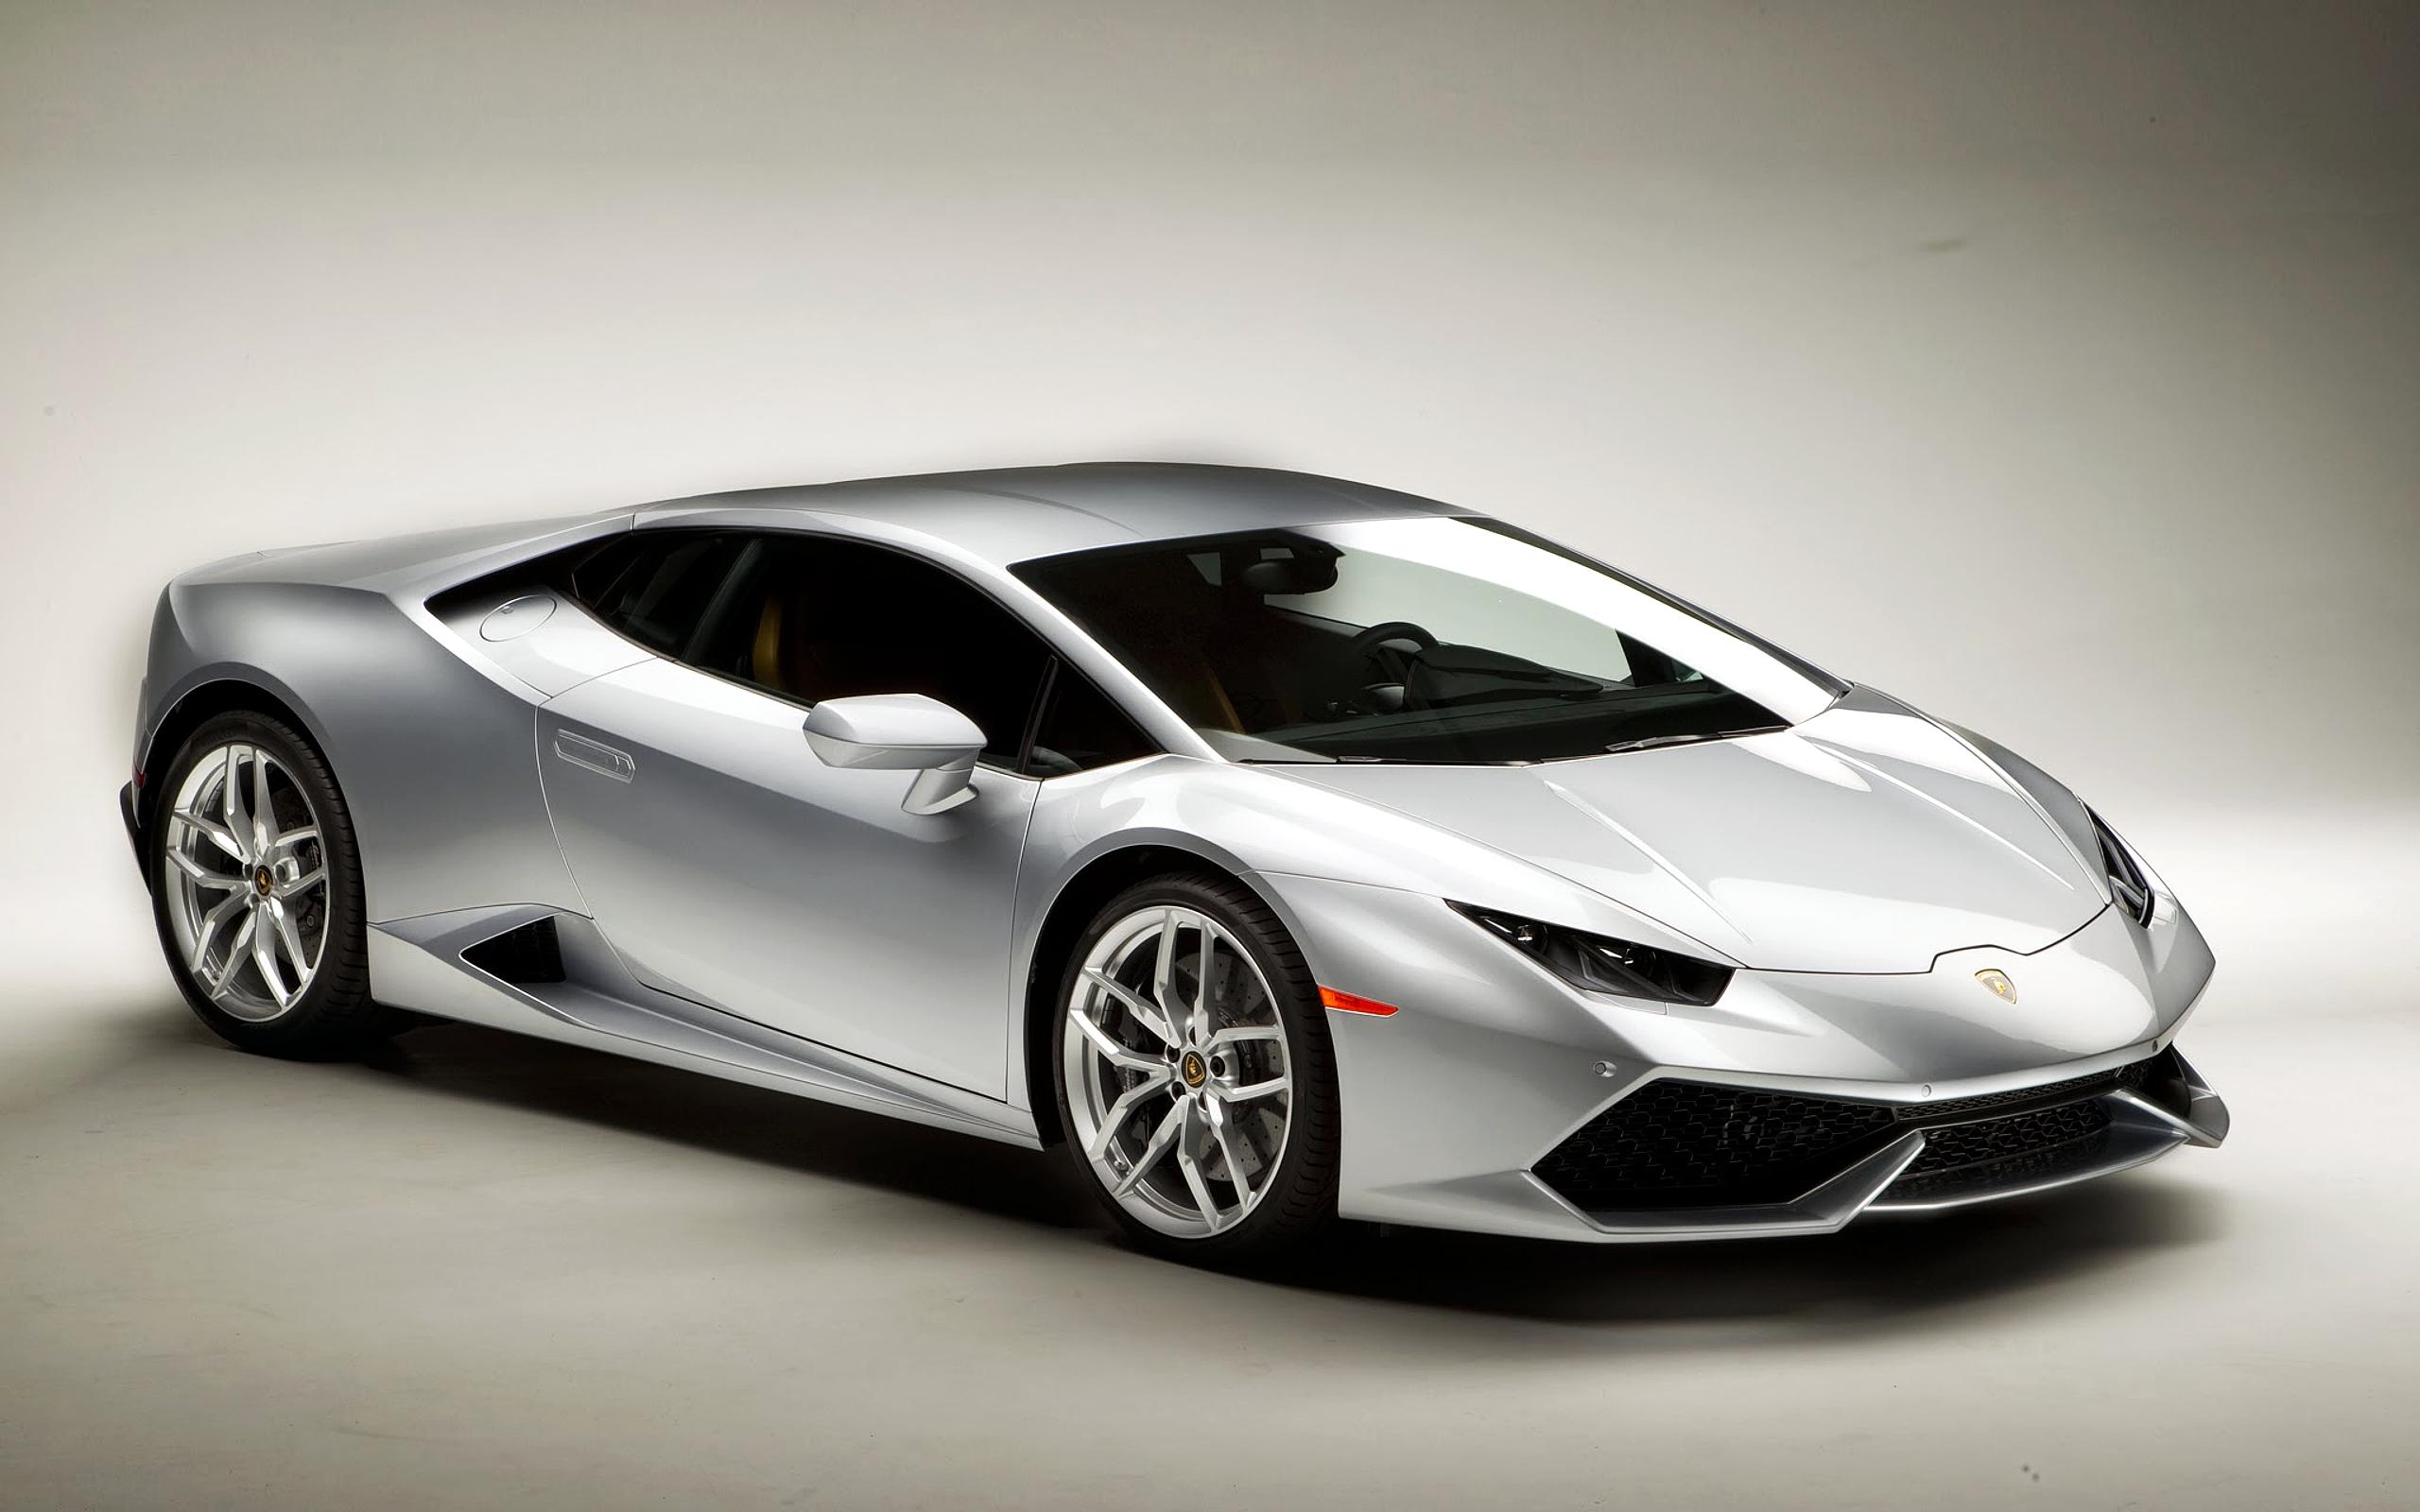 2560x1600px Lamborghini Huracan Wallpaper Hd Wallpapersafari